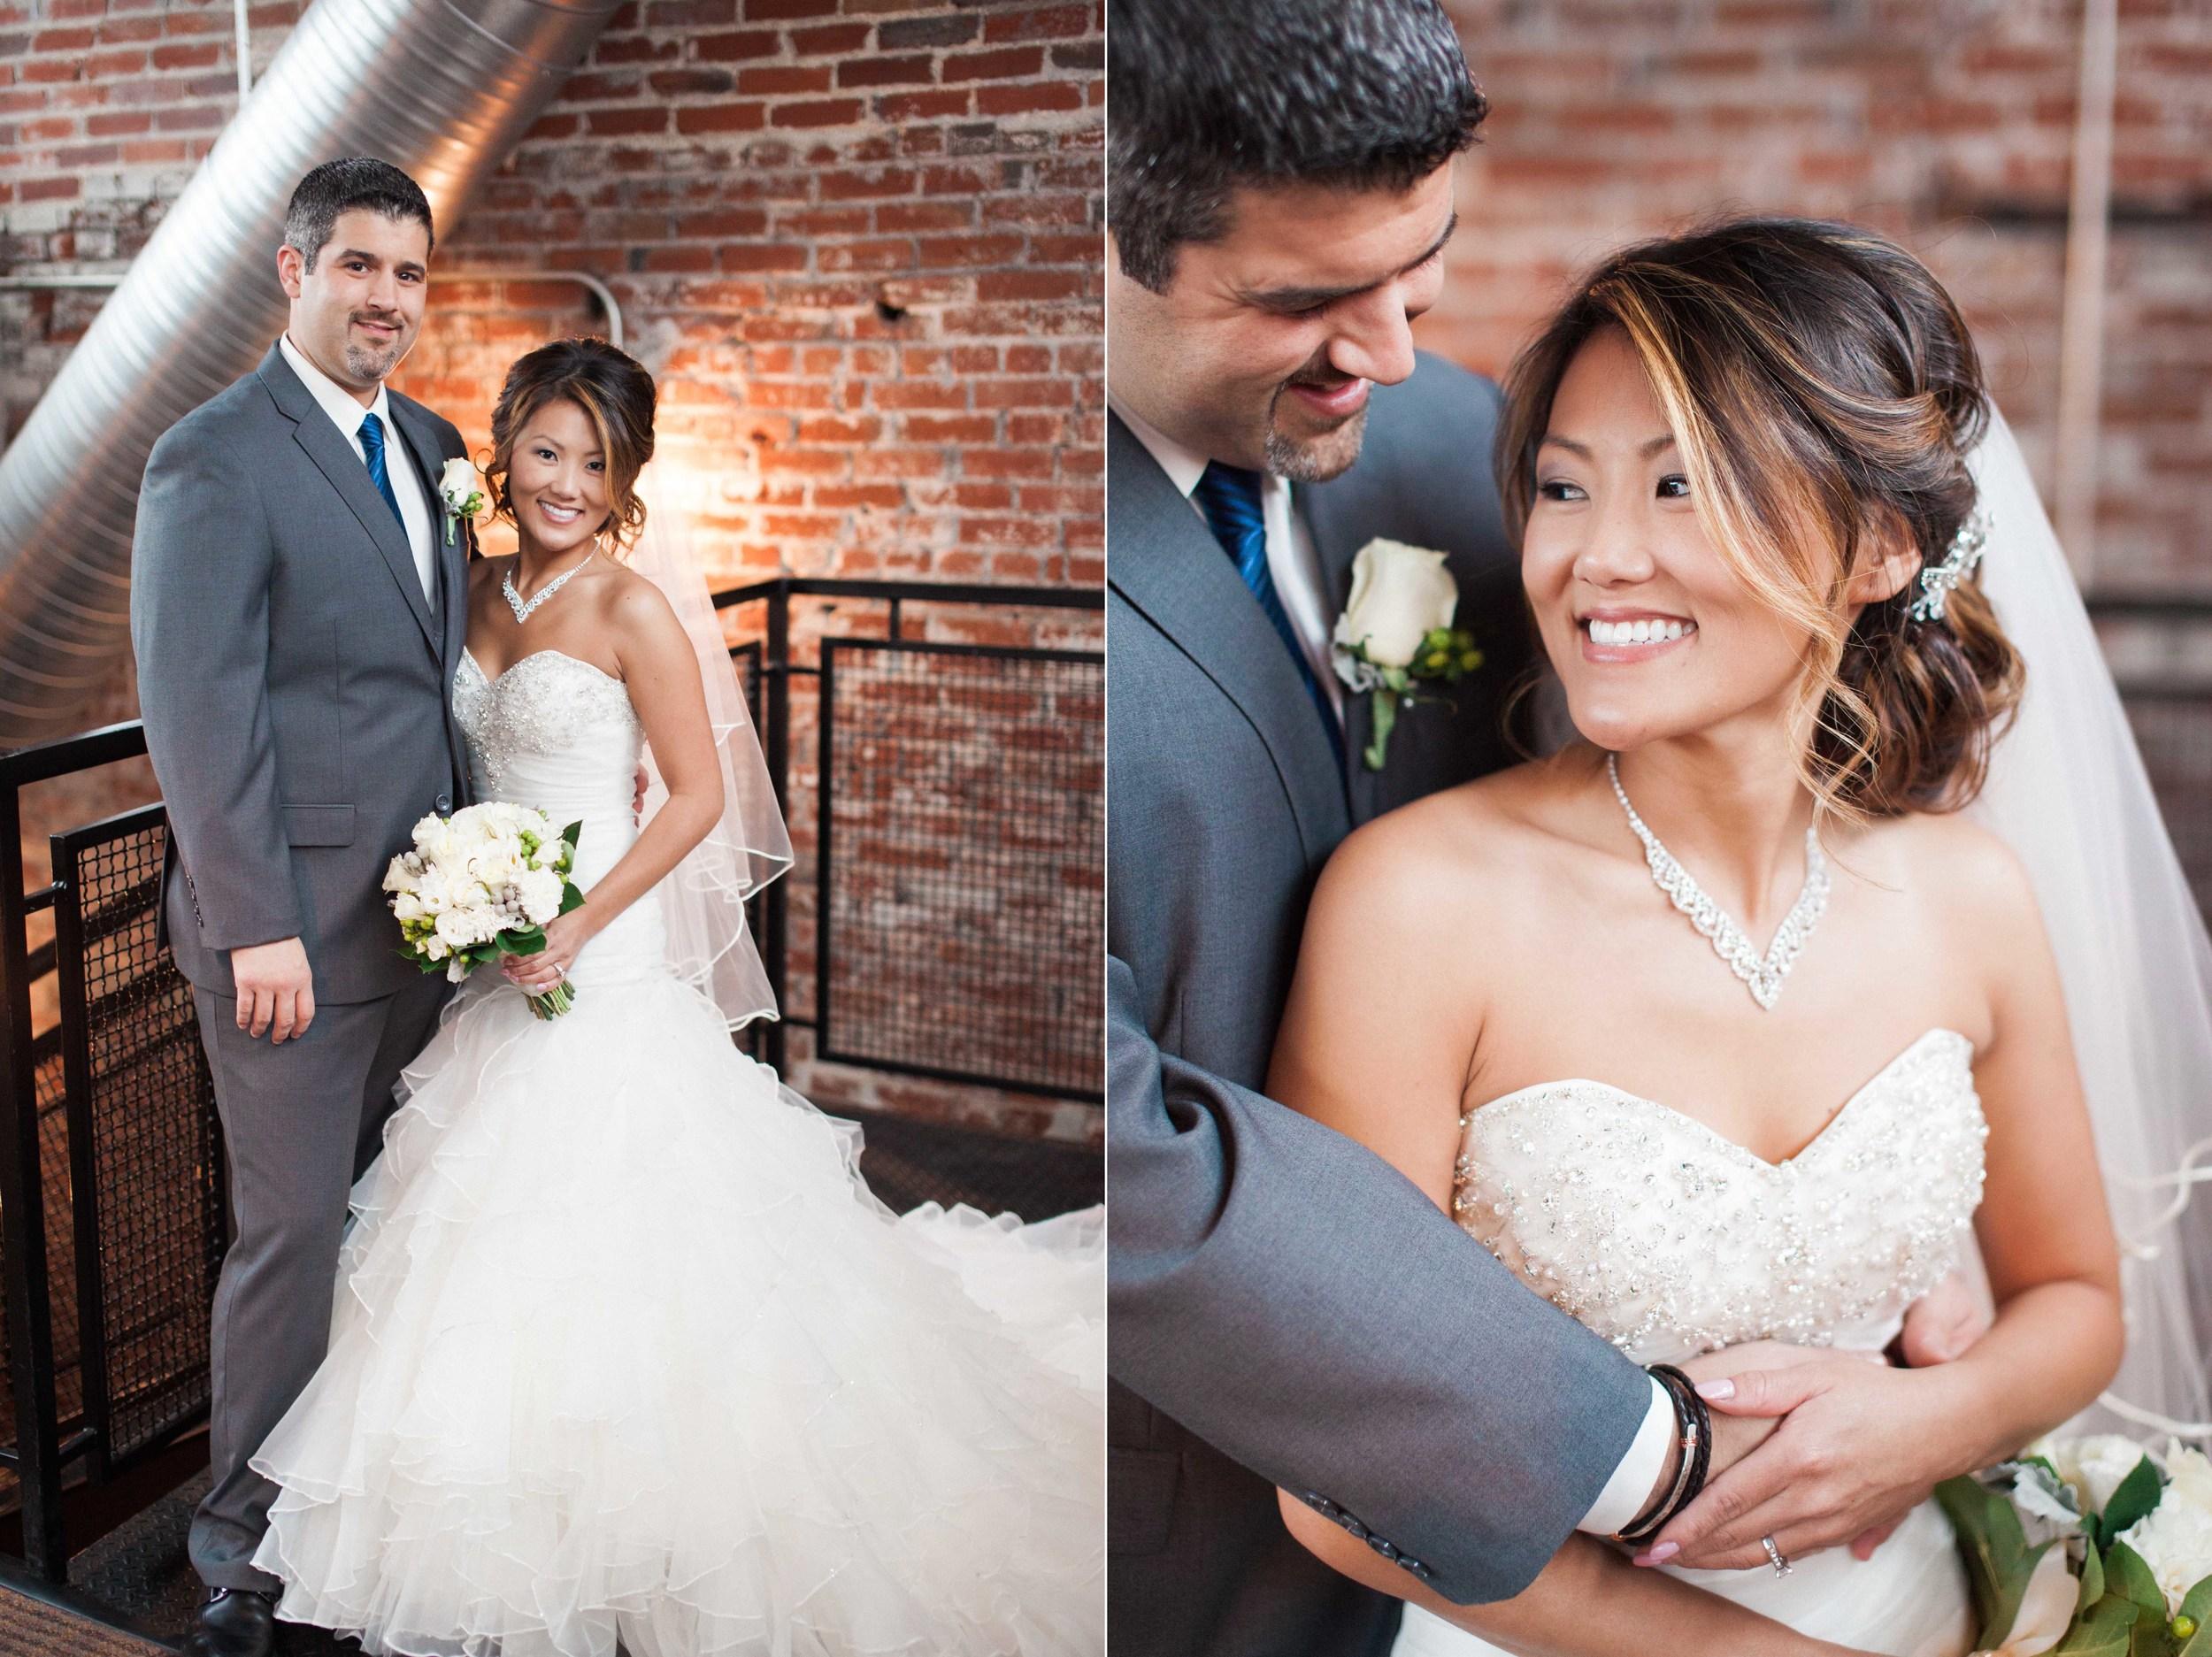 Sqwires Wedding Photos-1012 copy.jpg